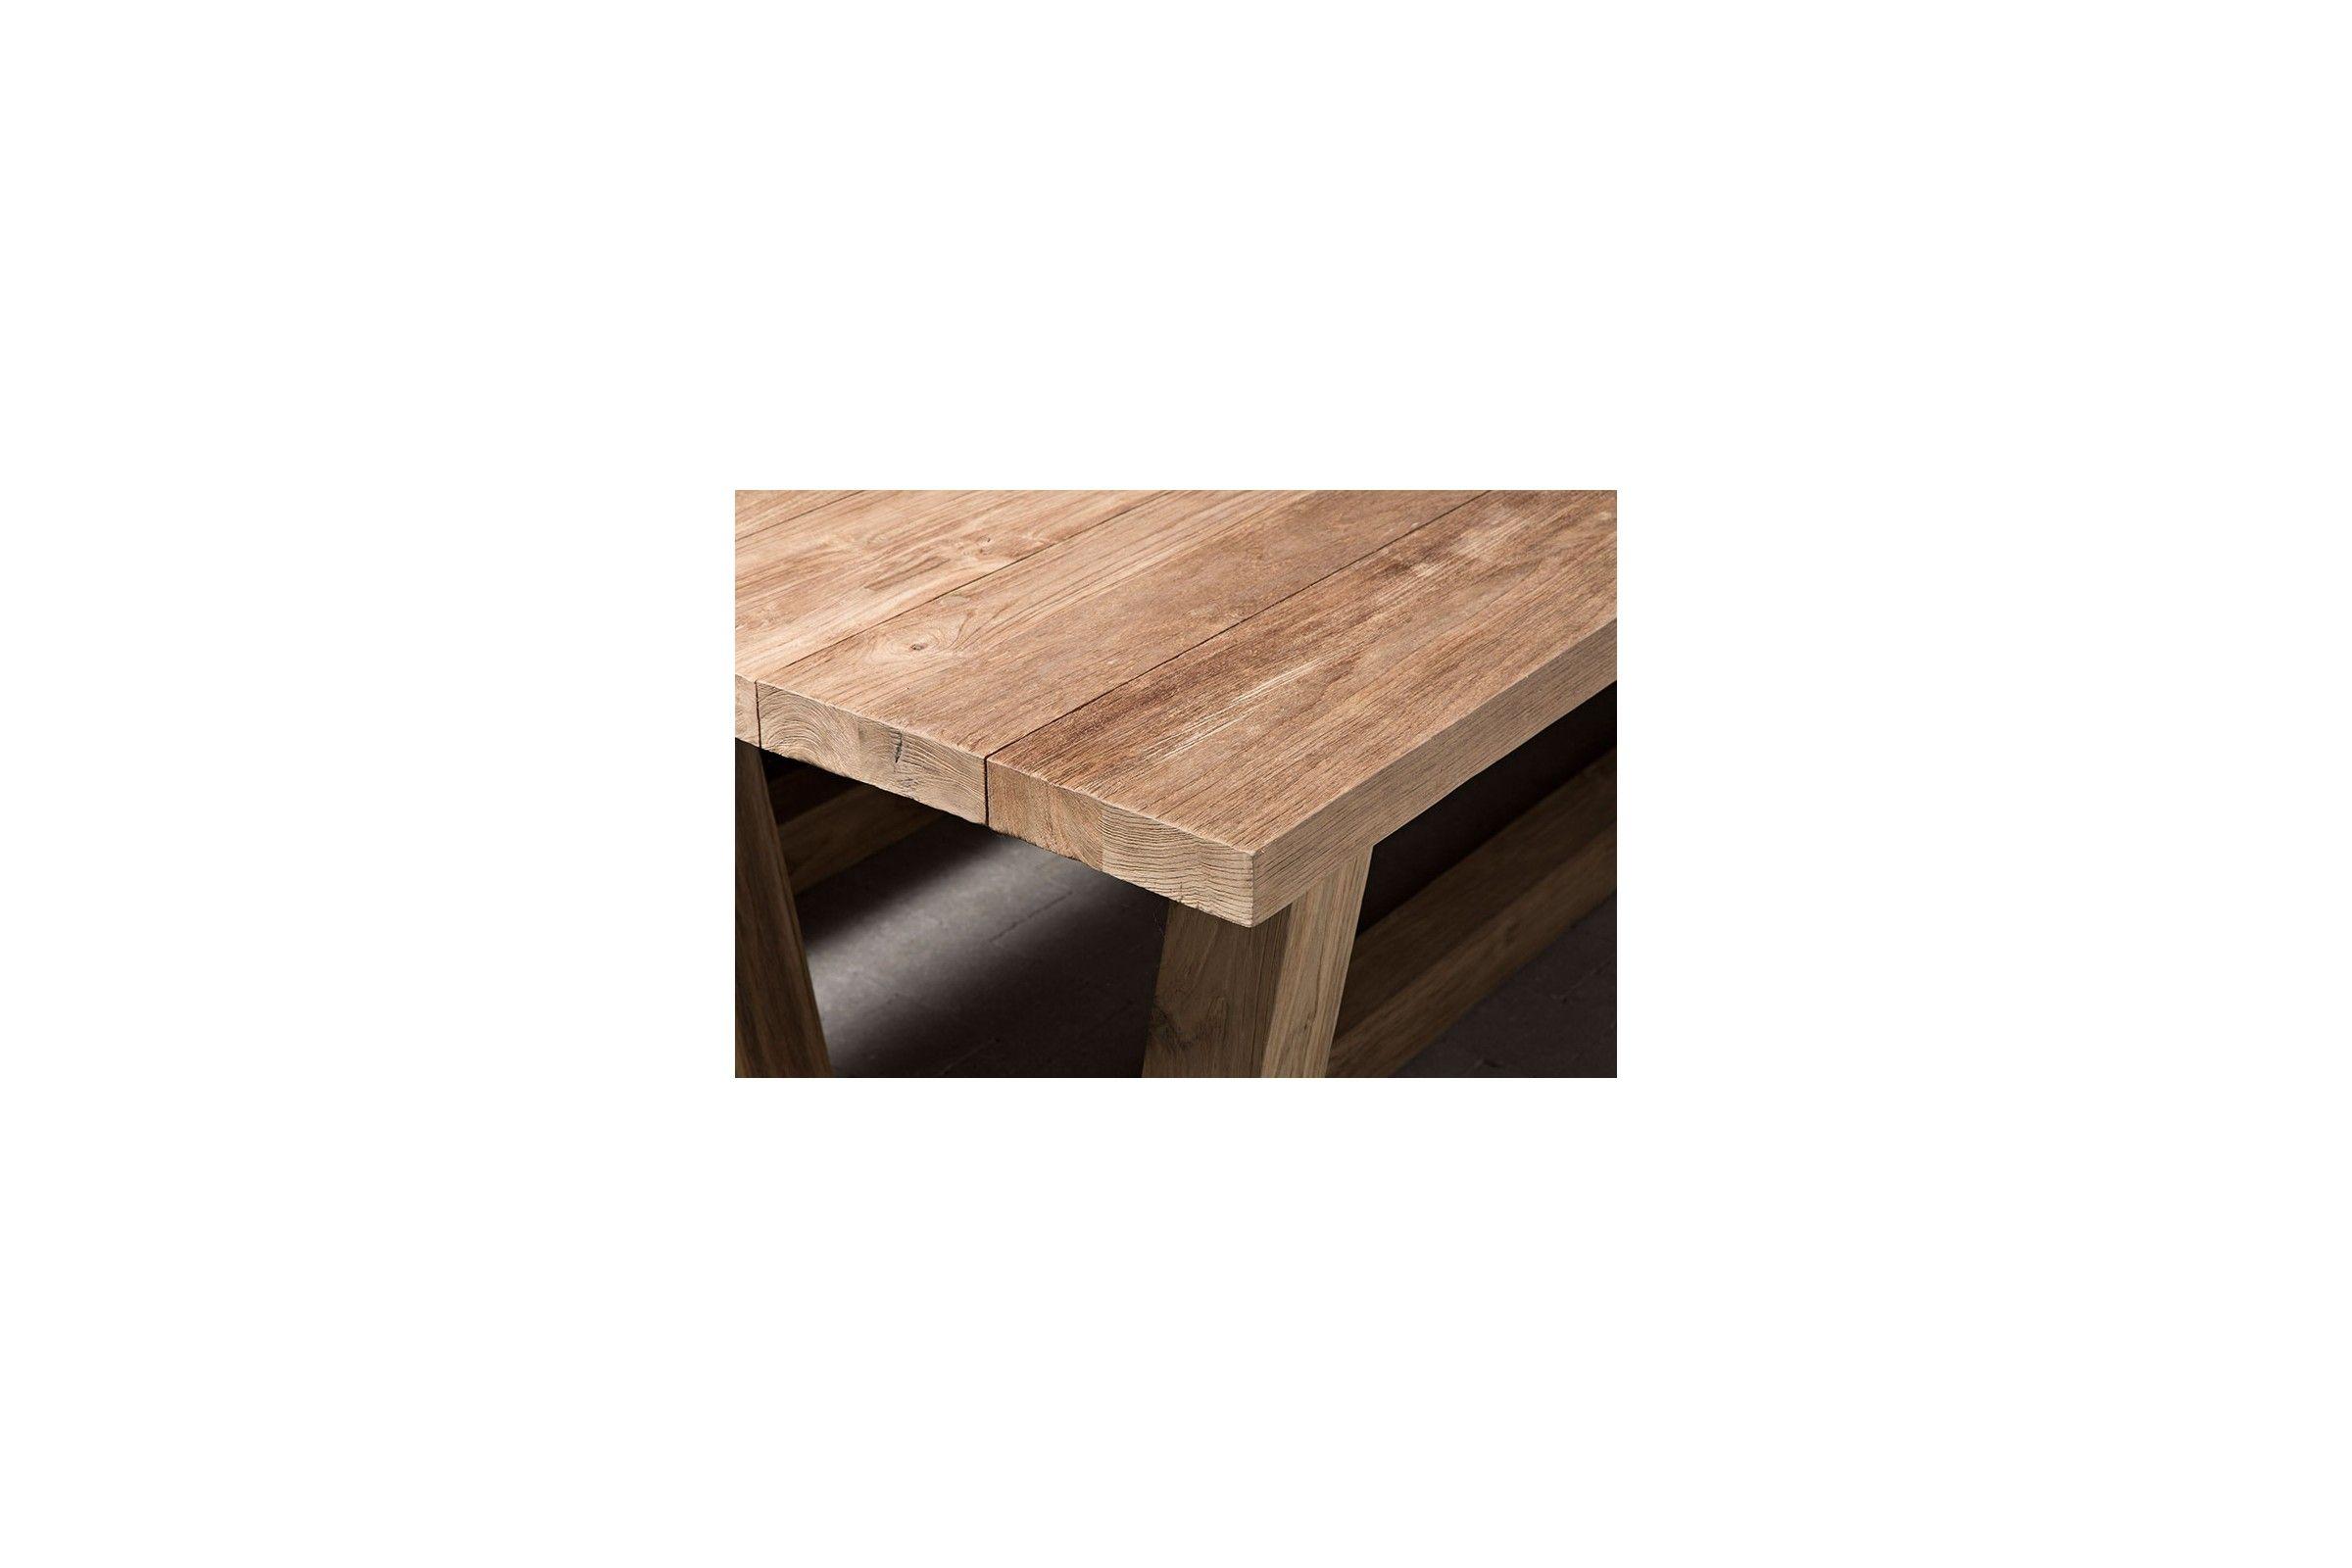 table en vieux teck massif 250 cm dundee. Black Bedroom Furniture Sets. Home Design Ideas